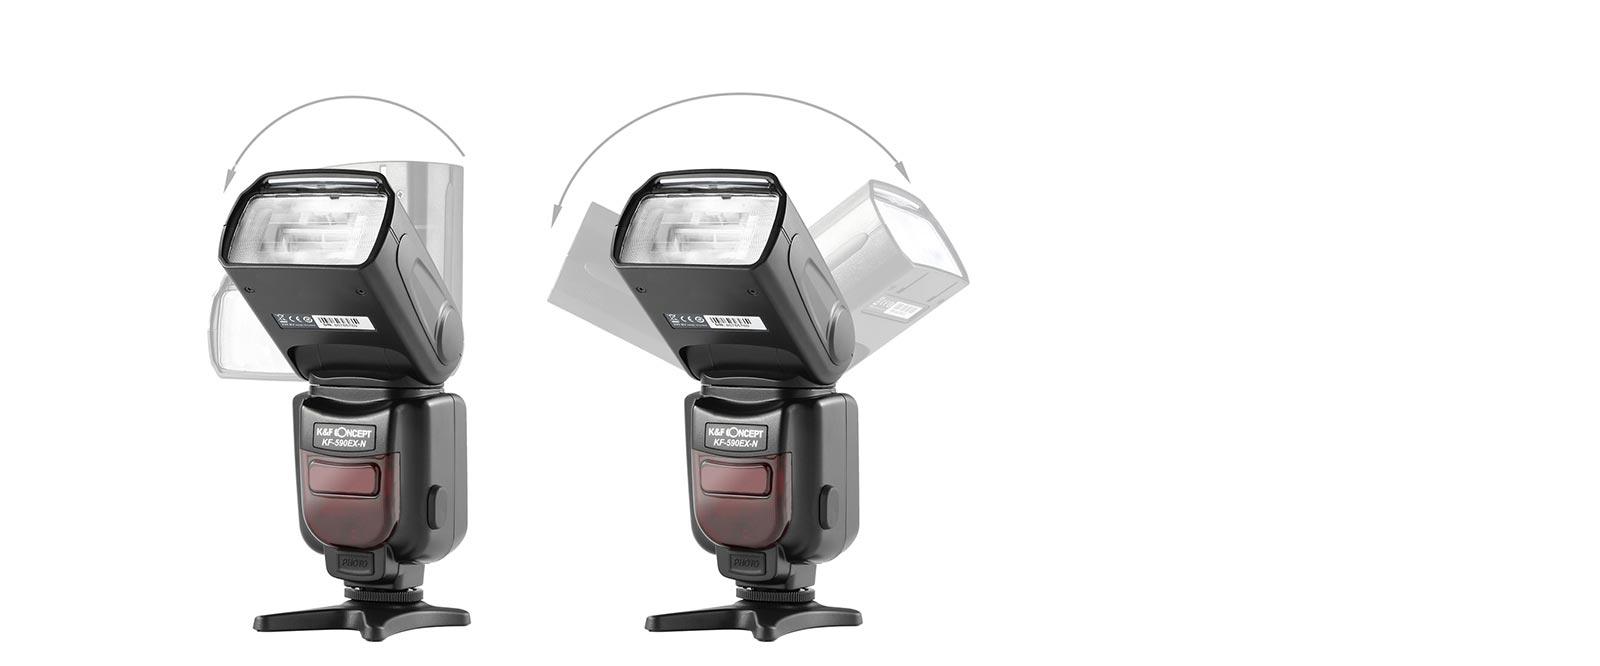 K&F Concept KF590N I-TTL Blitz Flash für Nikon GN56